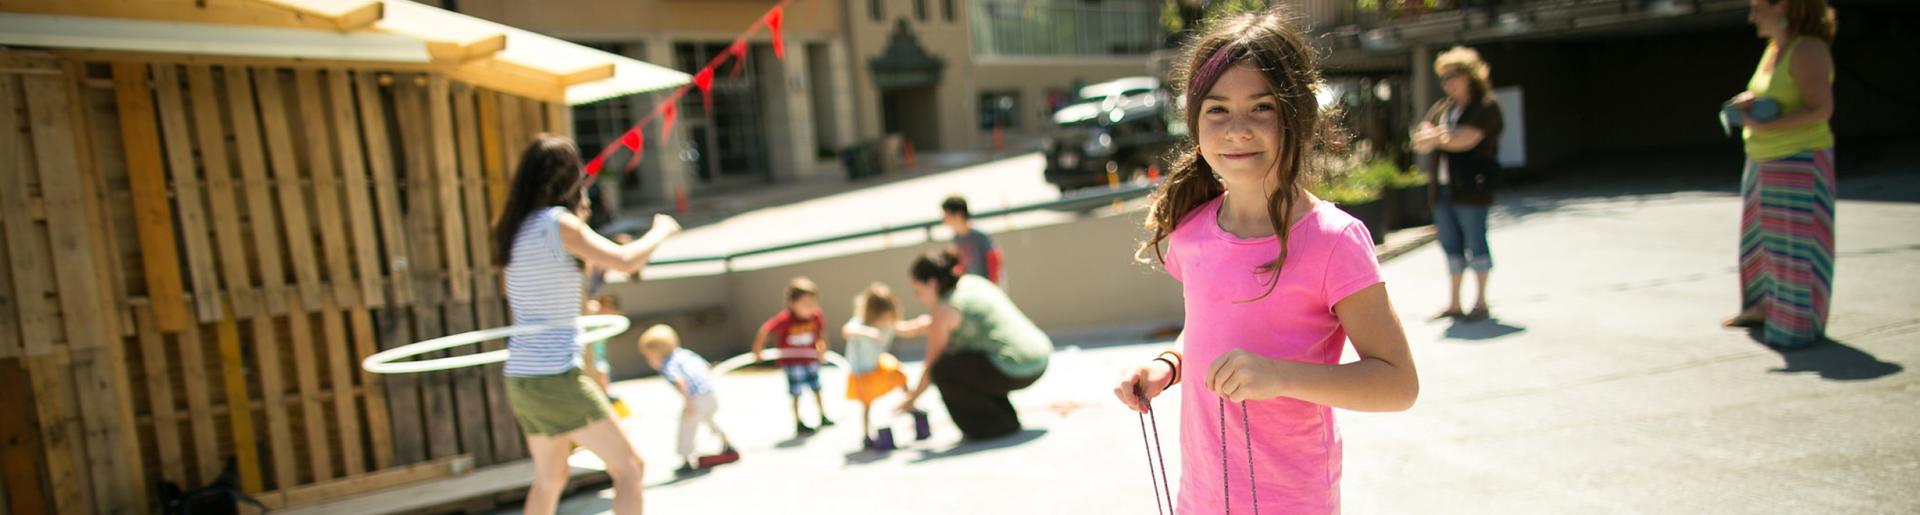 Madison Children's Museum Activities